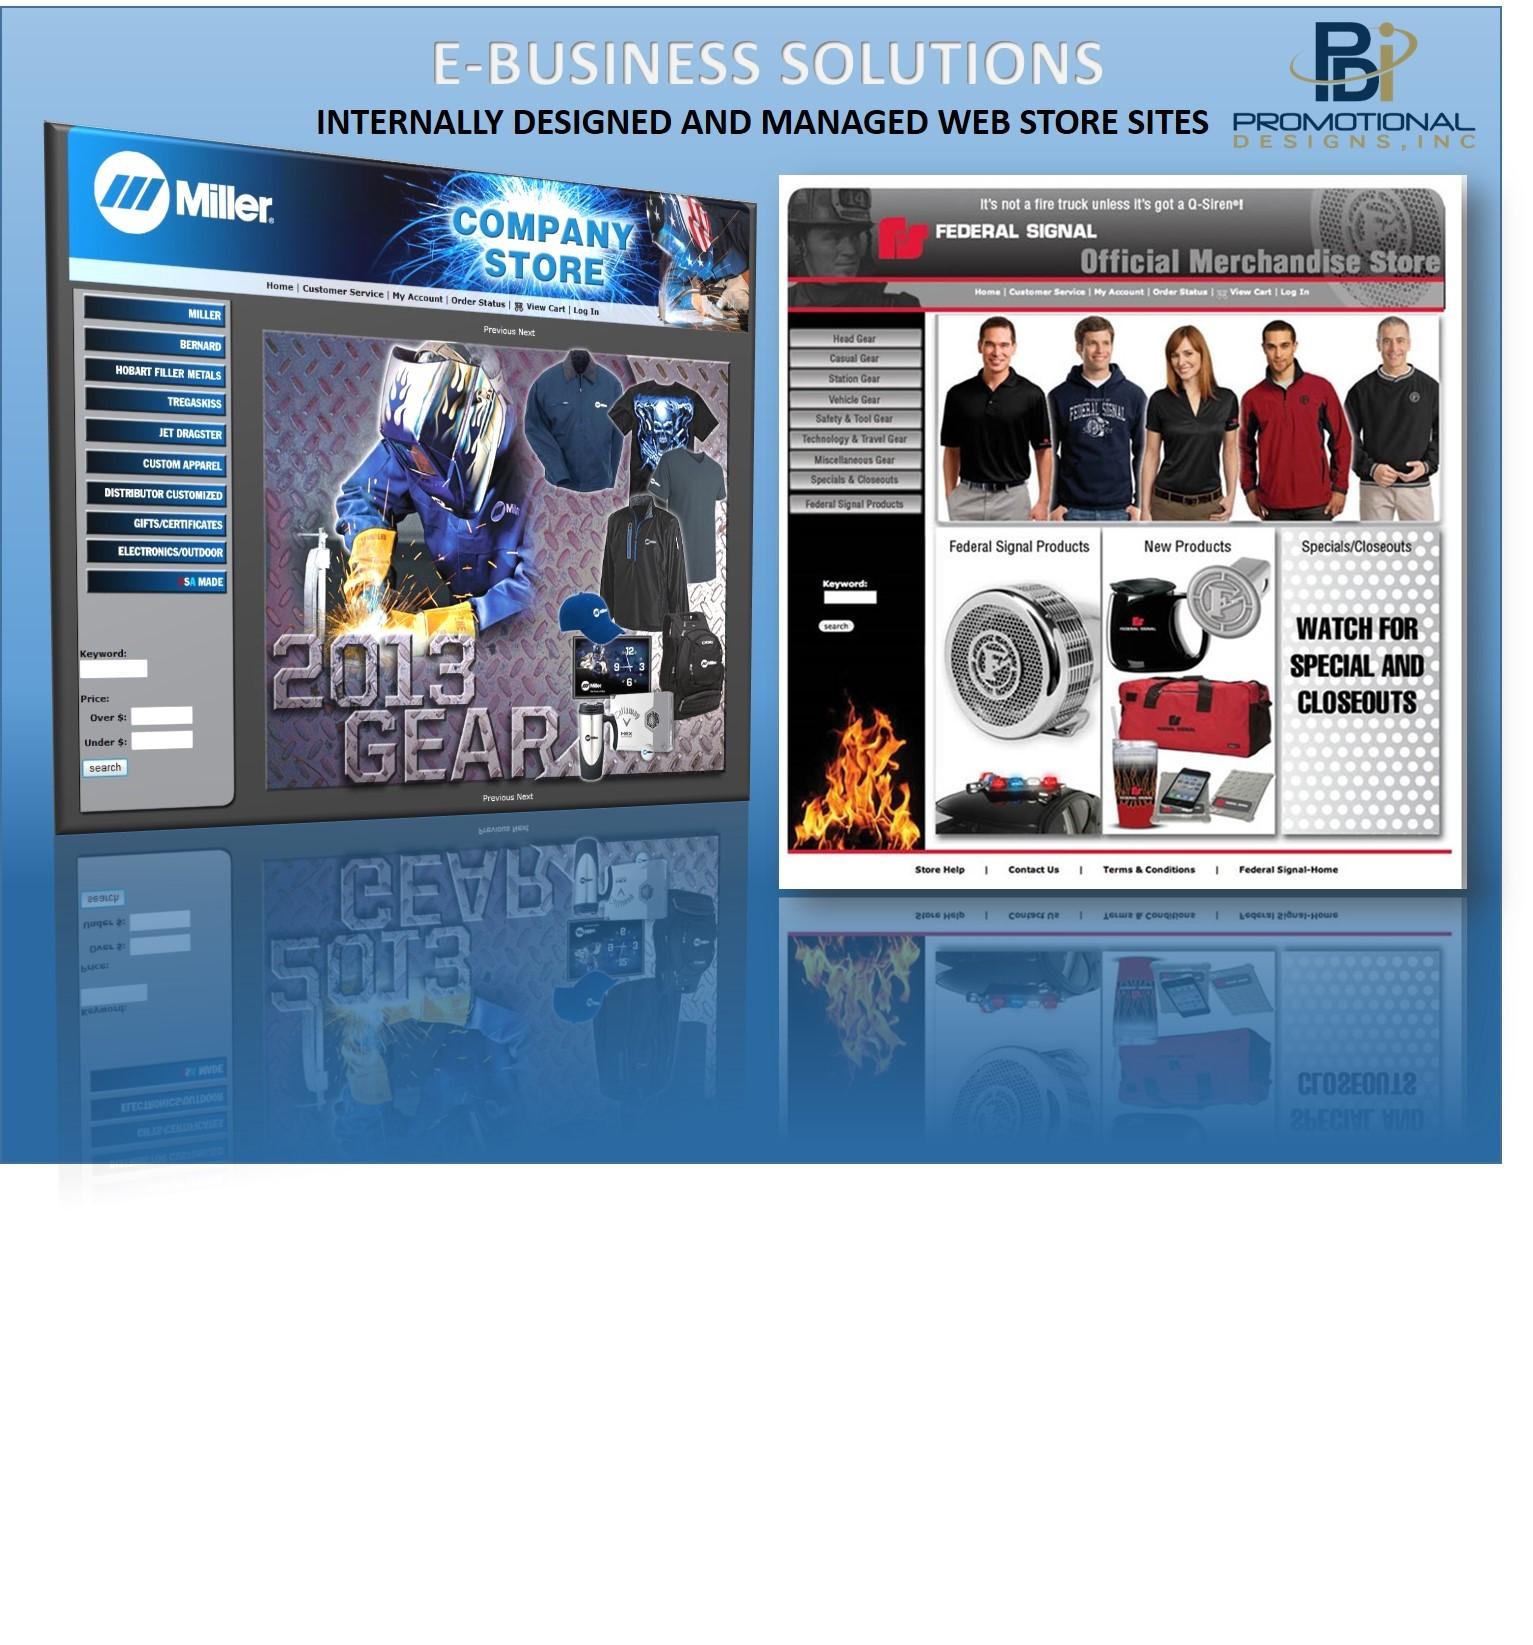 Promotional Design image 5